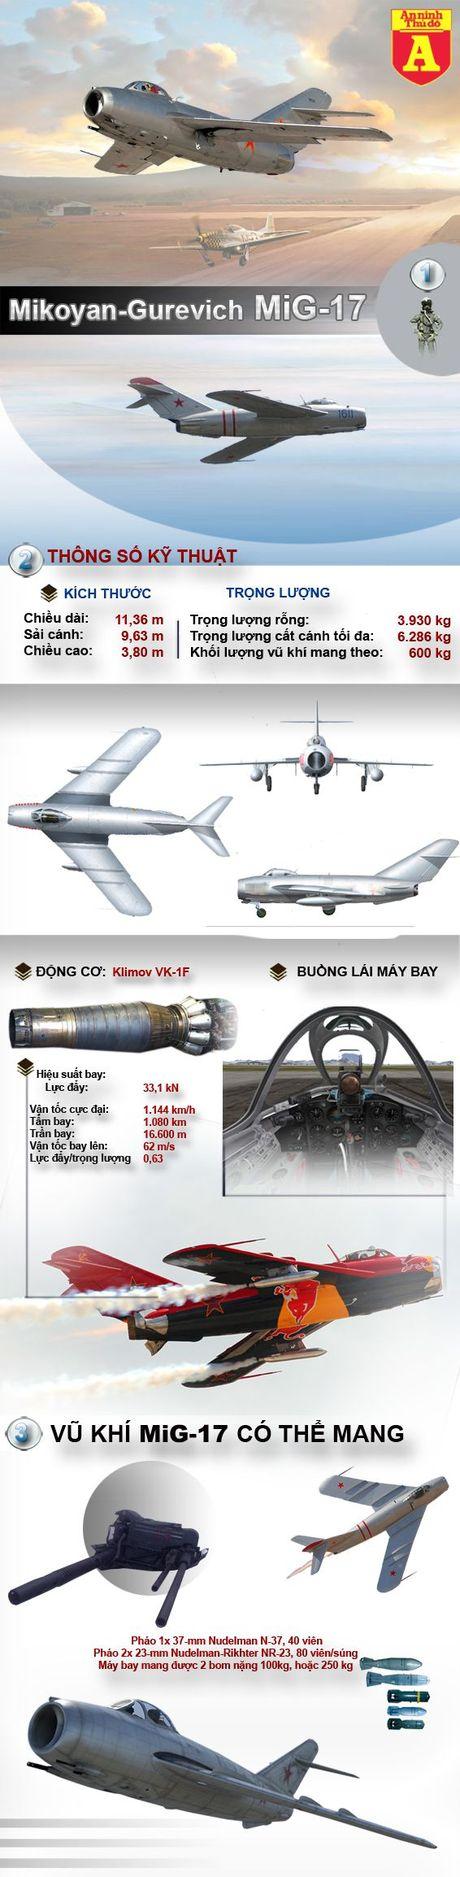 MiG-17 Huyen thoai tren bau troi Viet Nam lam My sung sot - Anh 1